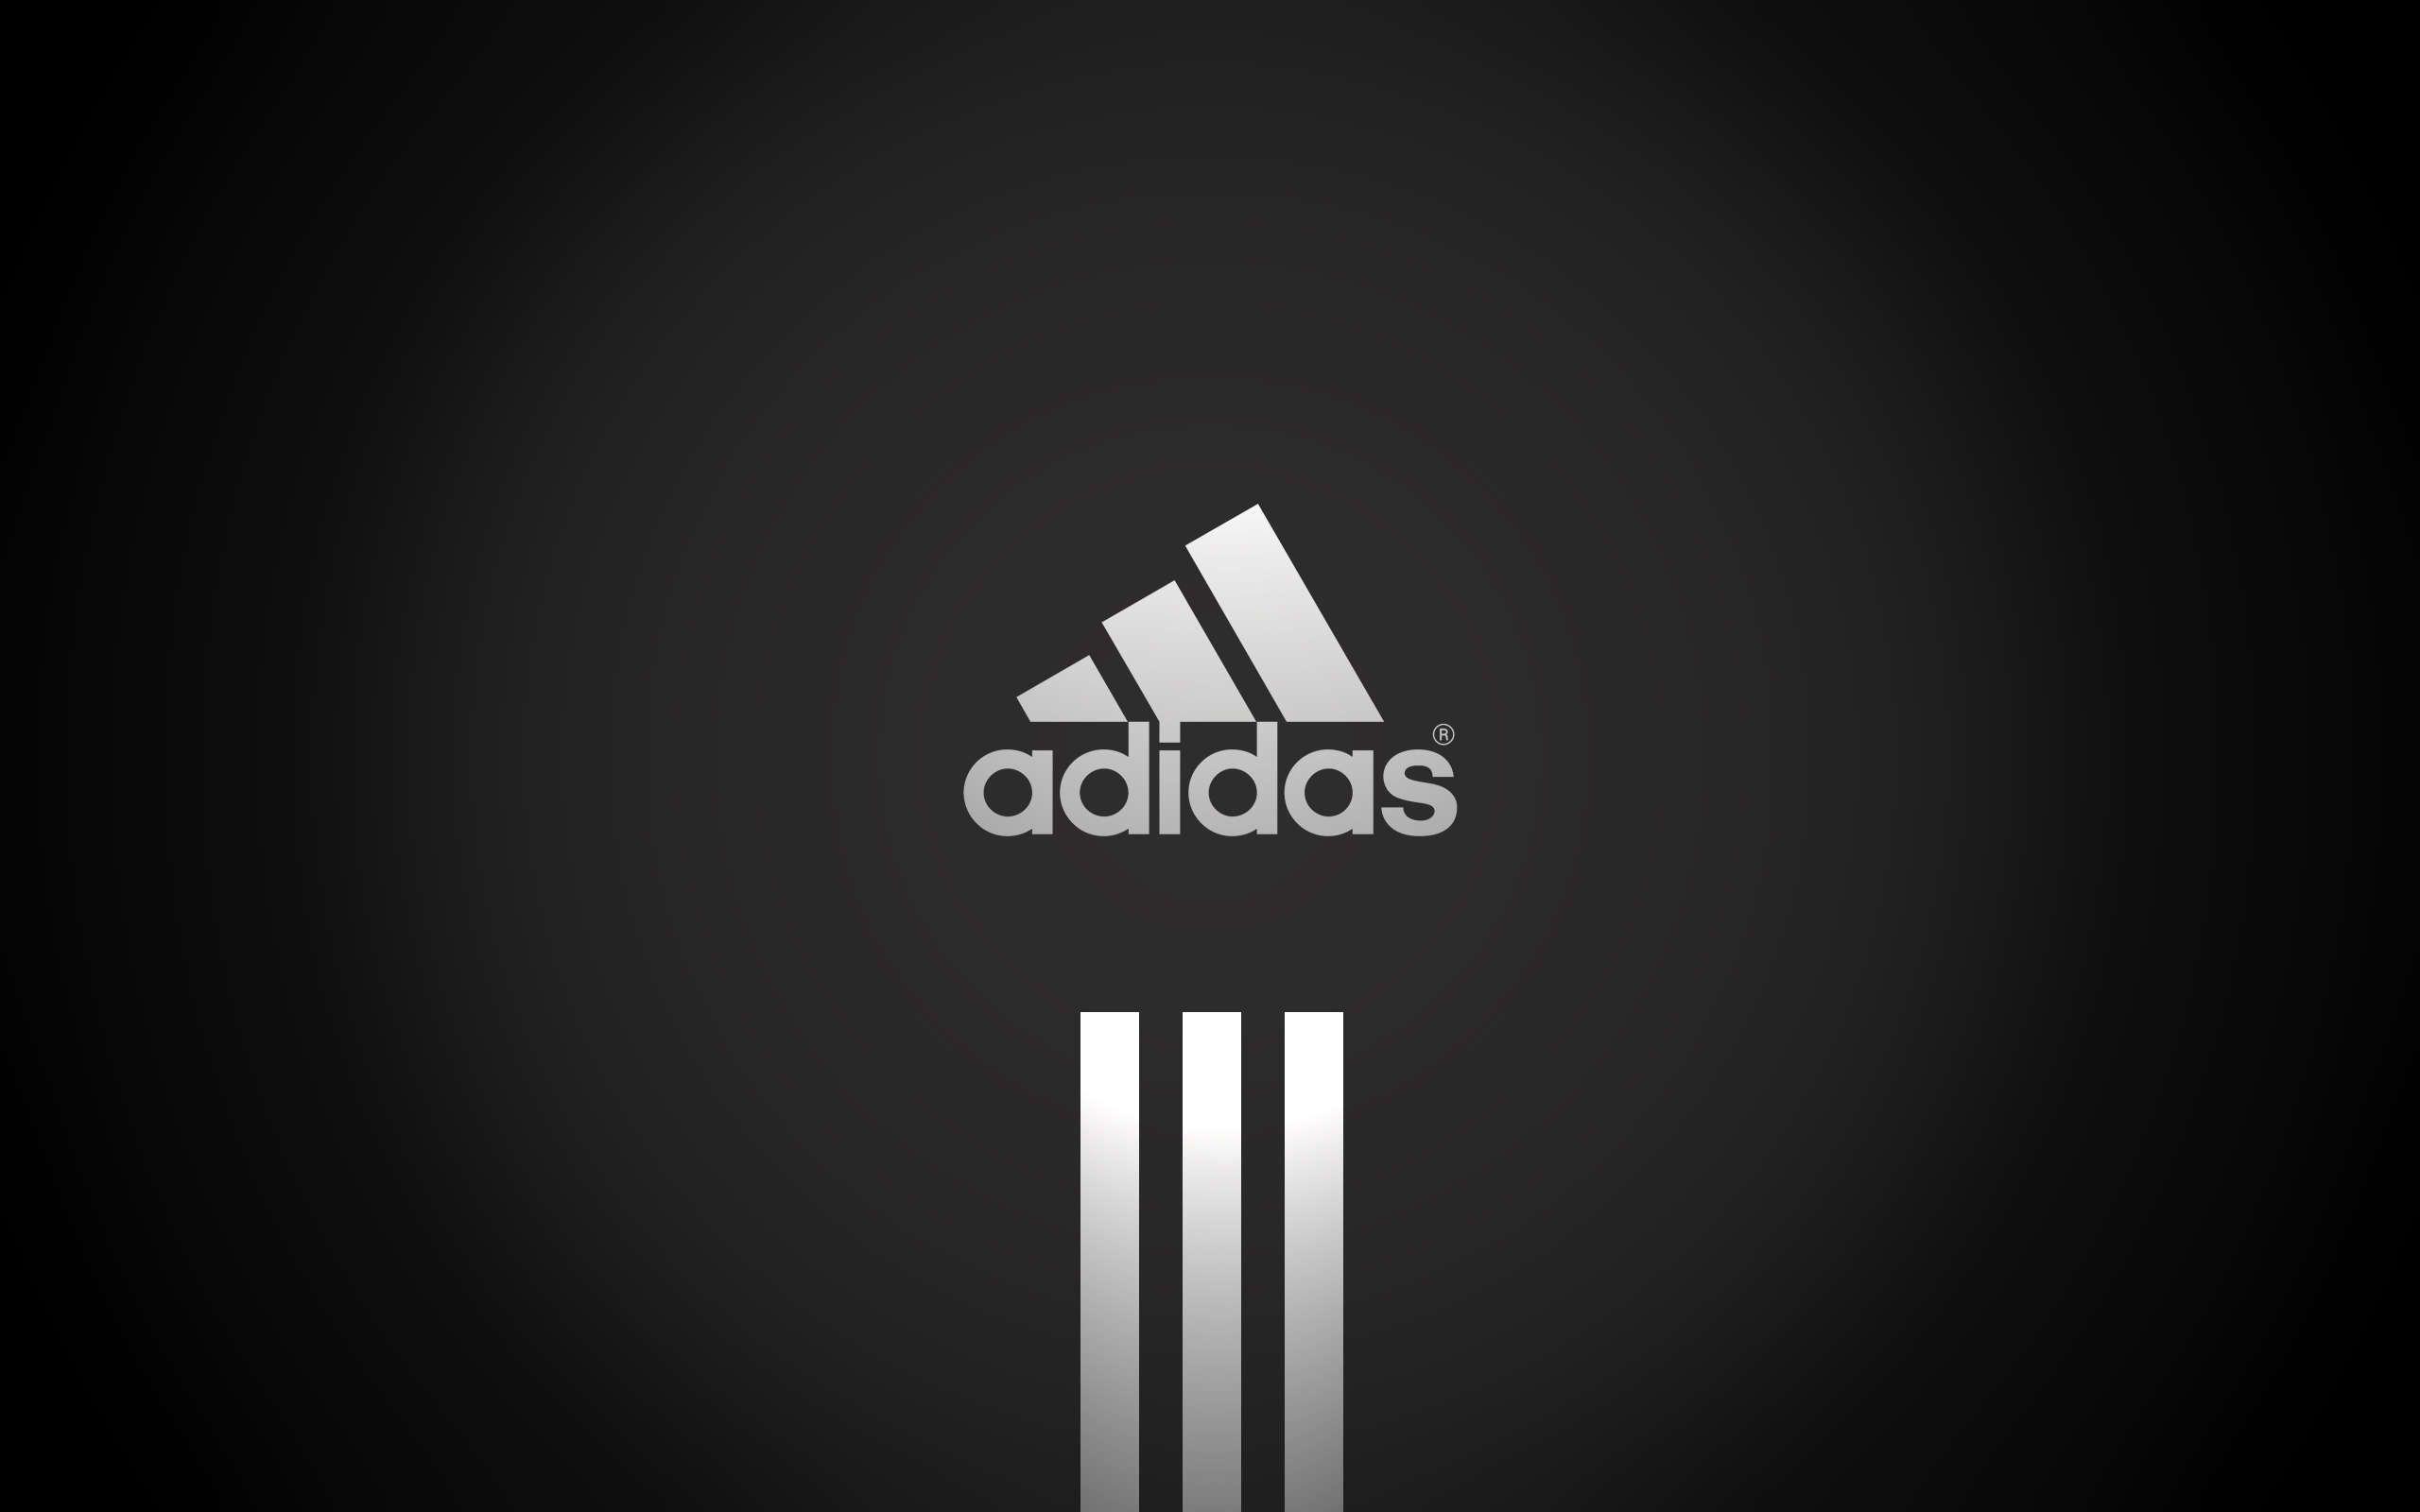 blackandwhiteadidasbackground yoyo Adidas Logo